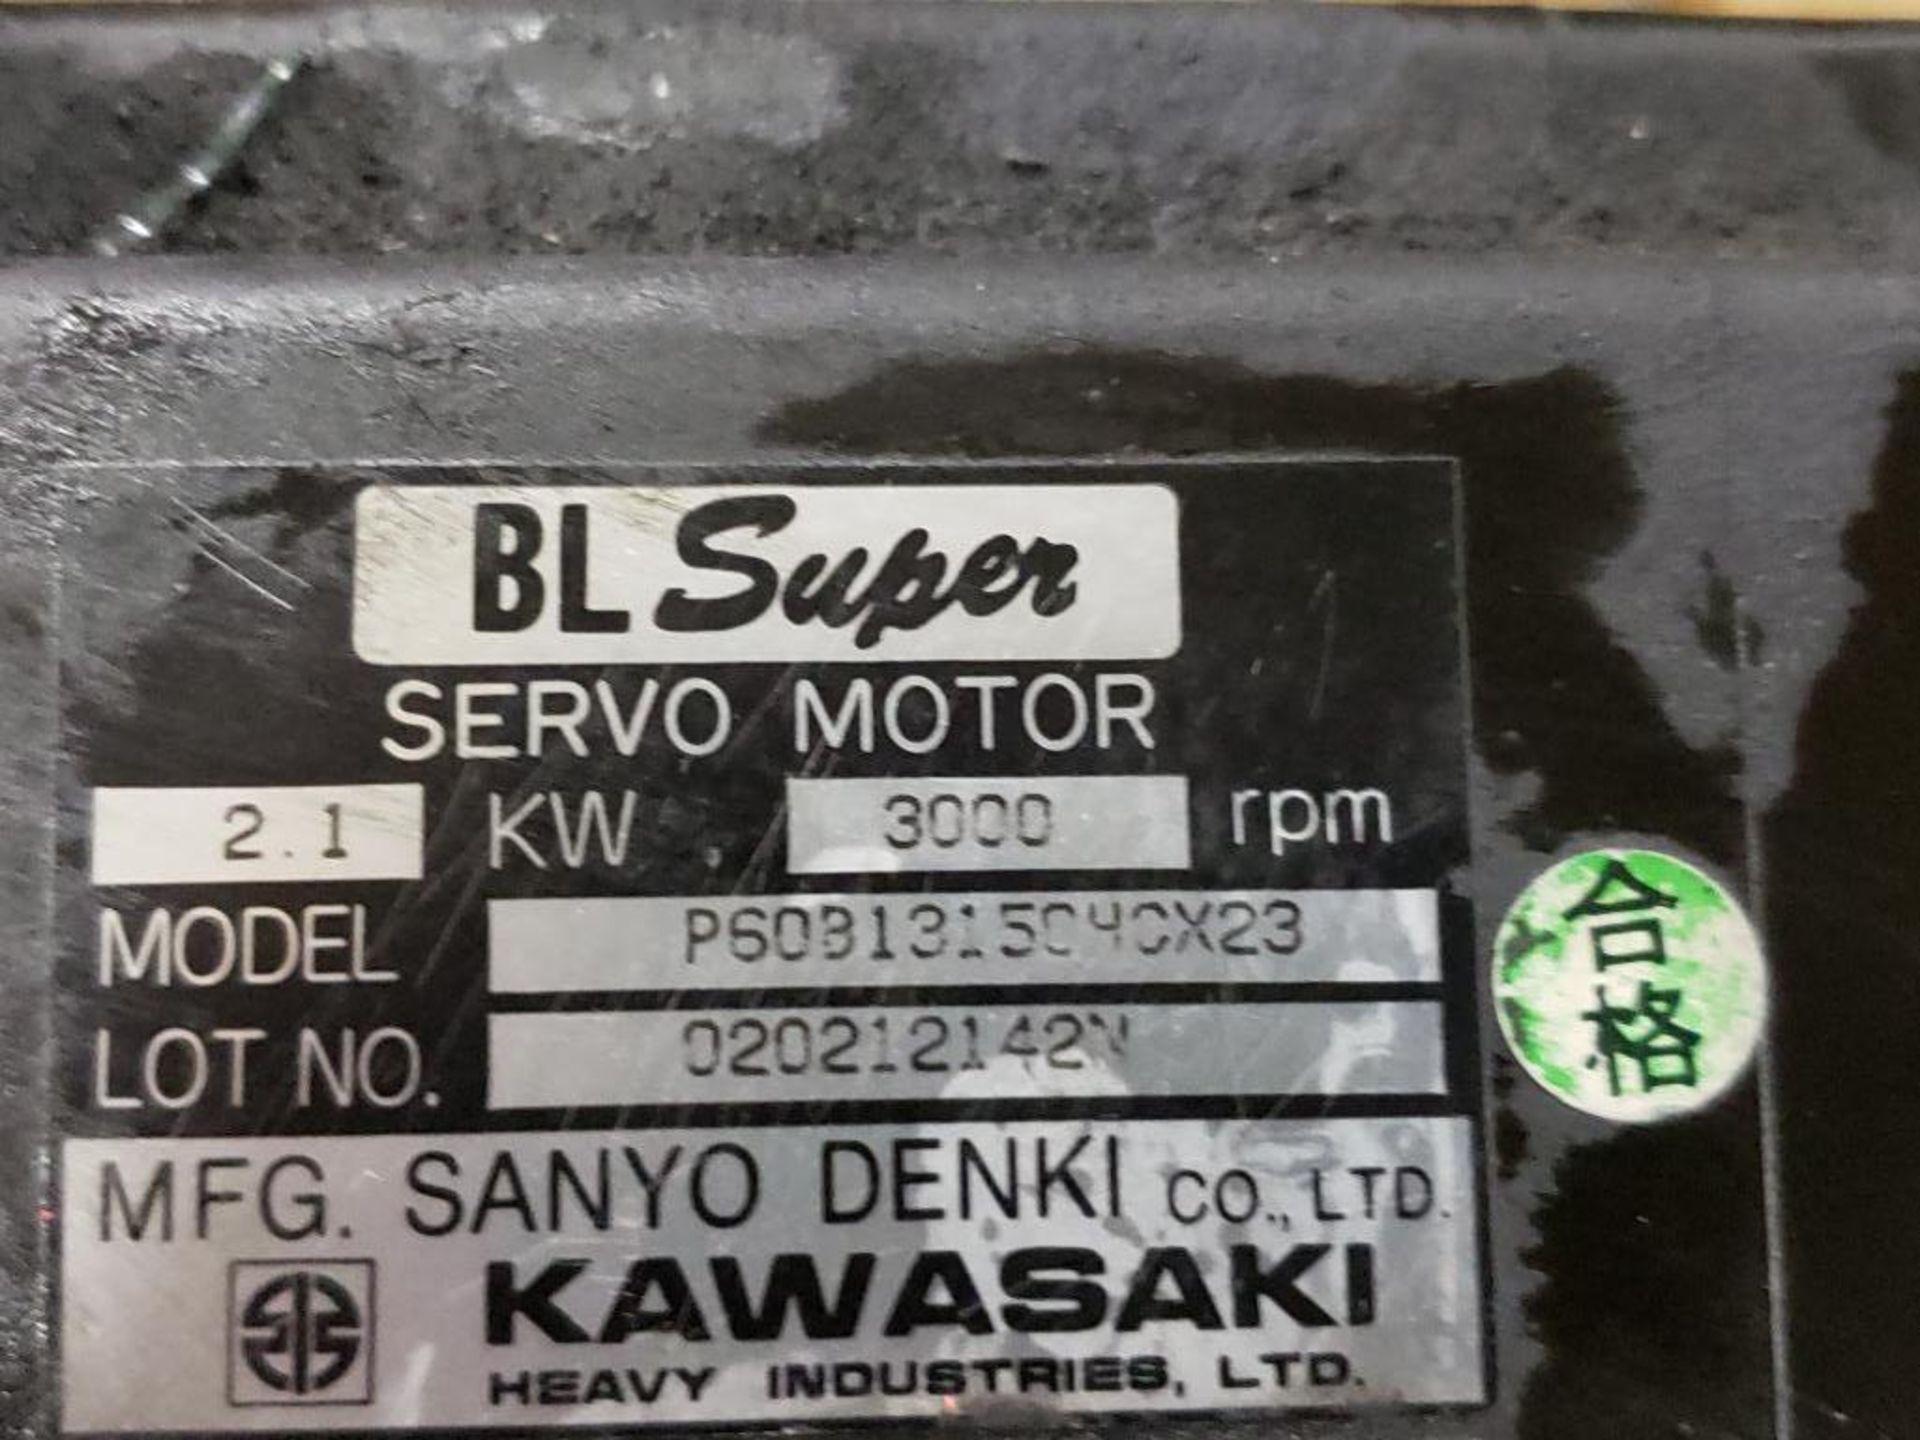 2.1kW Kawasaki Servo Motor P60B13150HCX23. 3000RPM. - Image 2 of 4